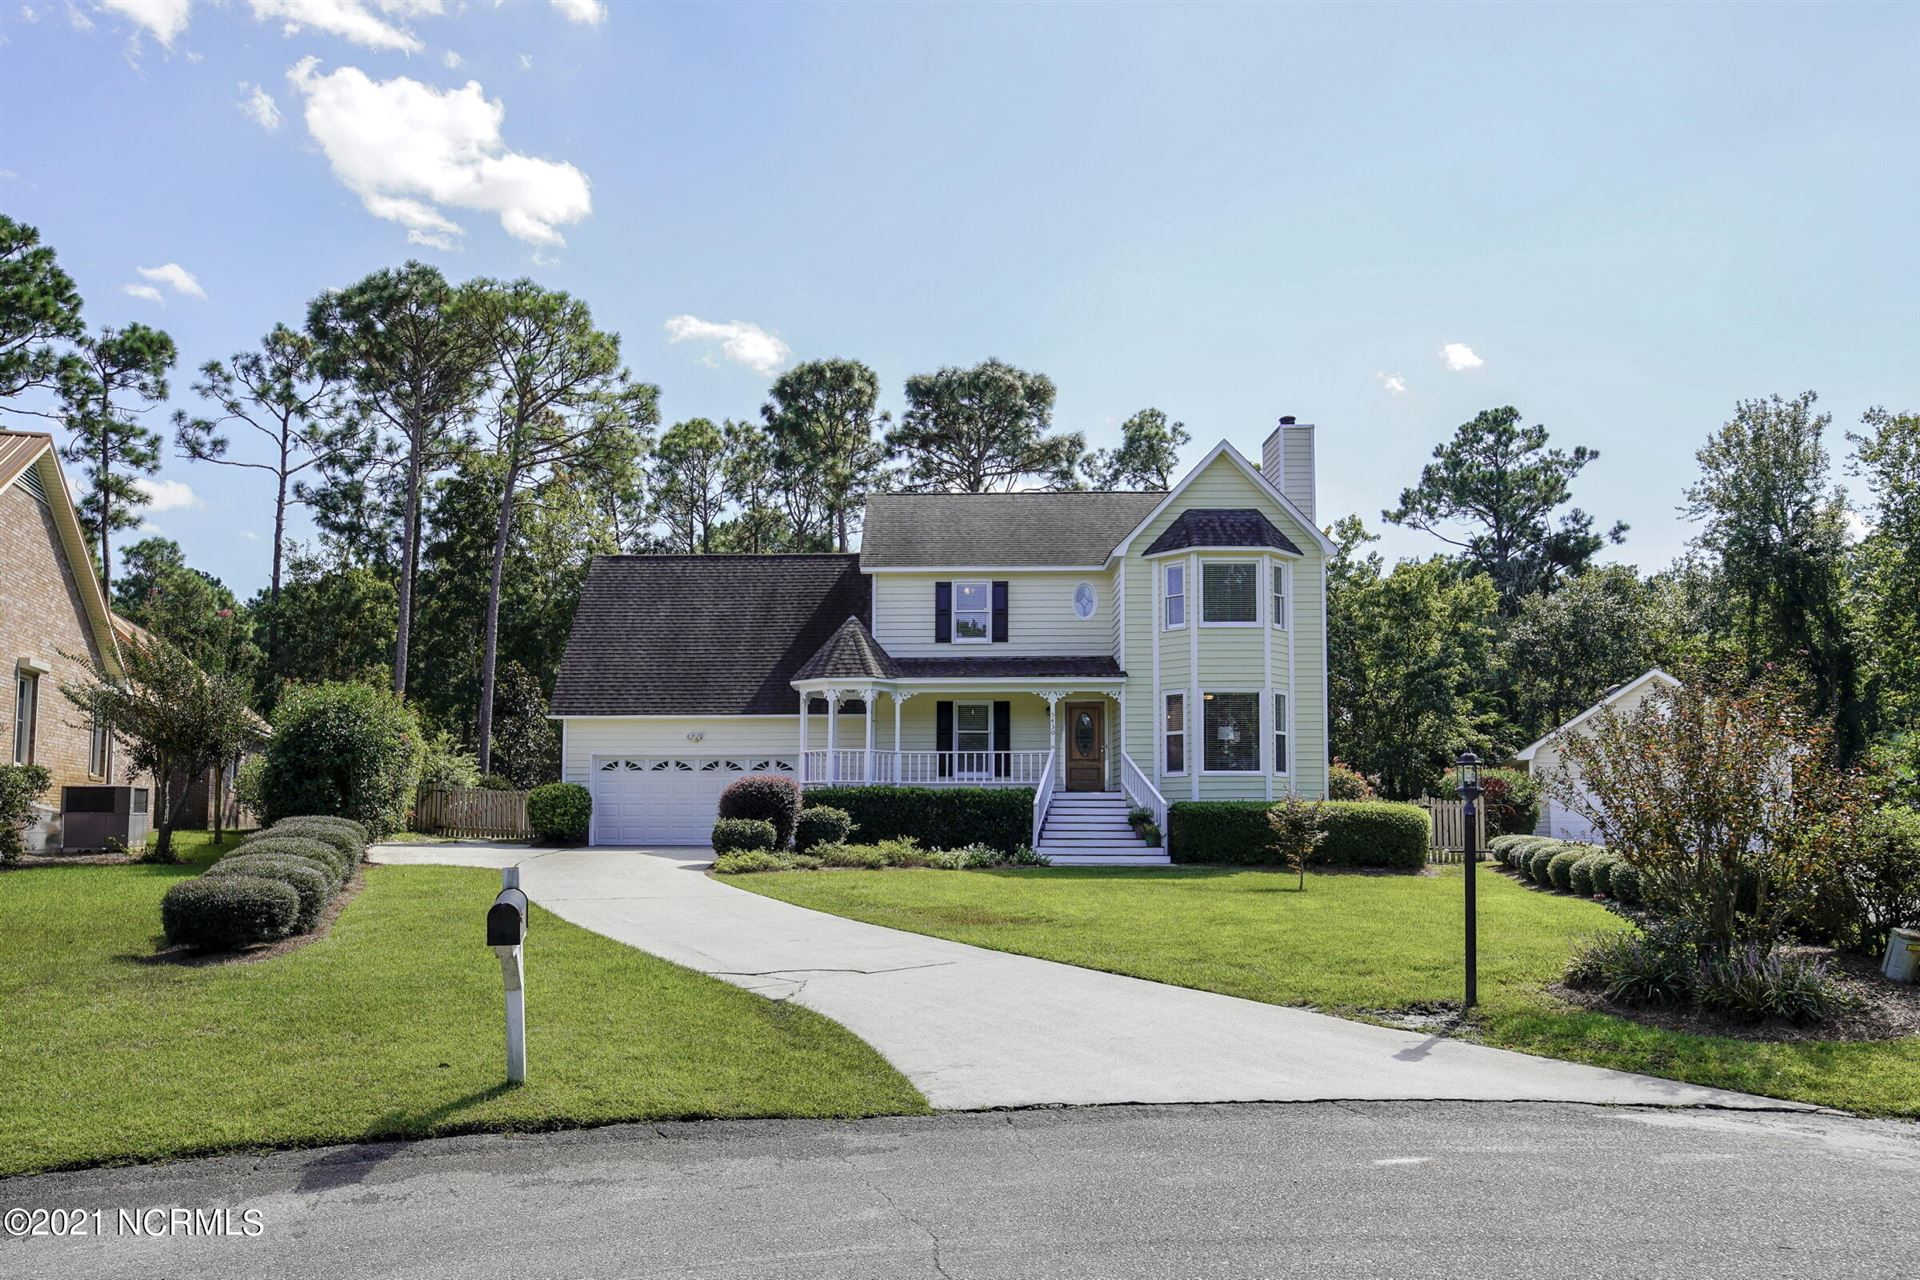 Photo of 5430 Whisper Creek Lane, Wilmington, NC 28409 (MLS # 100292592)